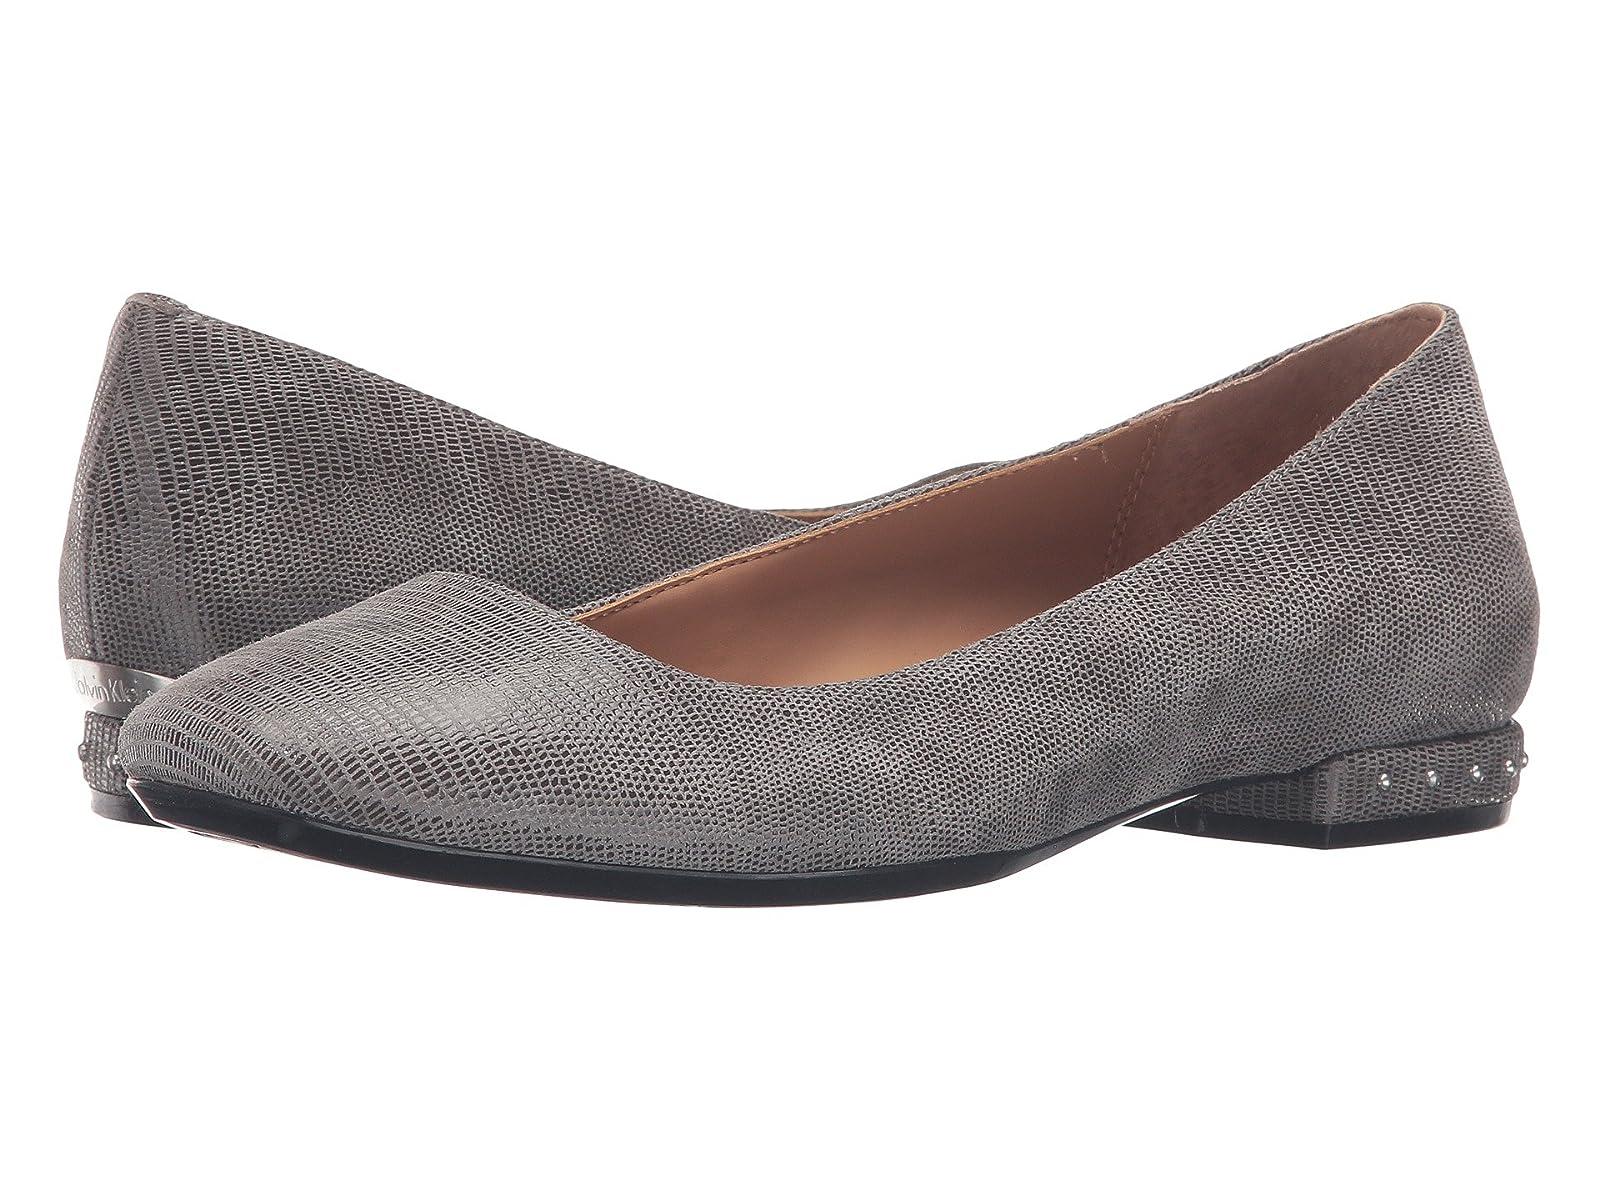 Calvin Klein FridelleCheap and distinctive eye-catching shoes